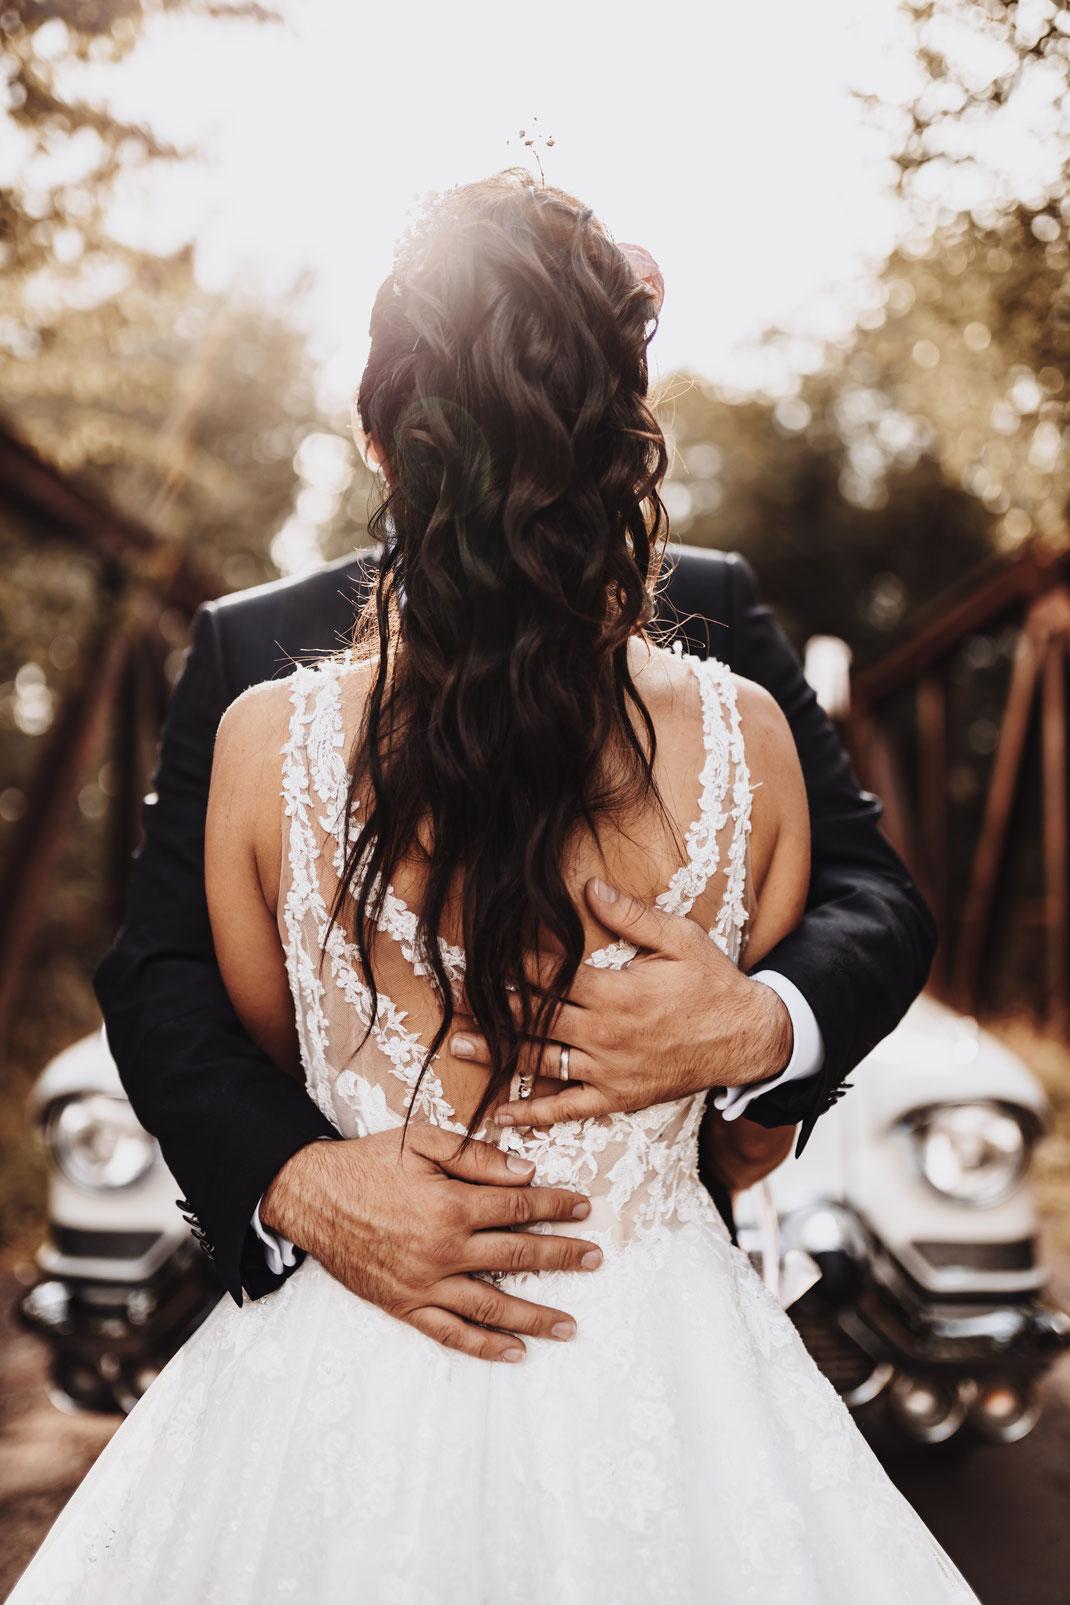 Hochzeitsfotograf Saarland - Fotograf Kai Kreutzer 132